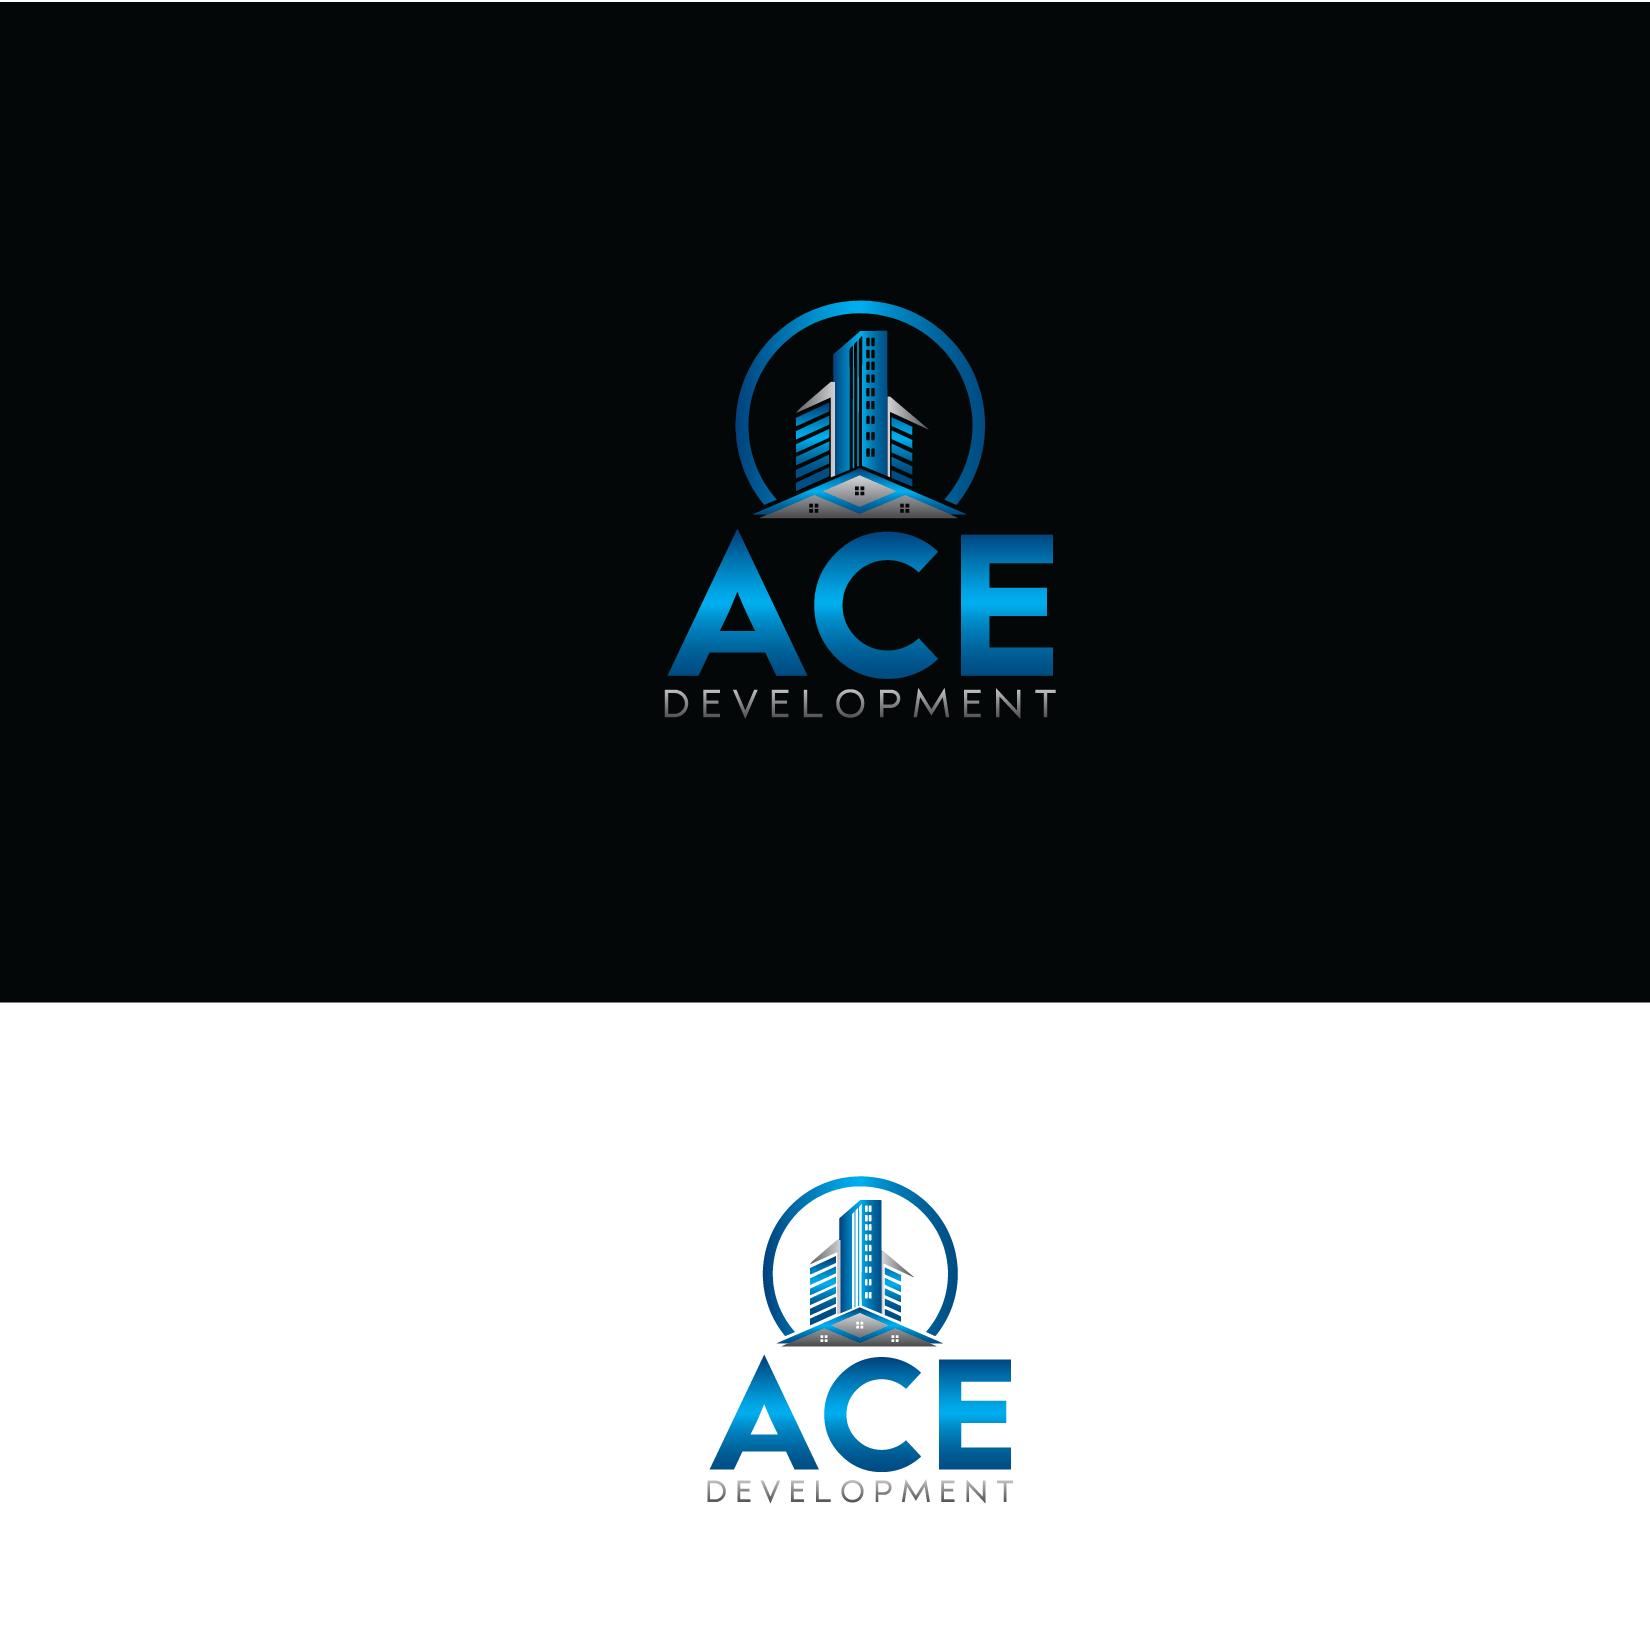 Logo Design by Private User - Entry No. 101 in the Logo Design Contest Fun Logo Design for Ace development.